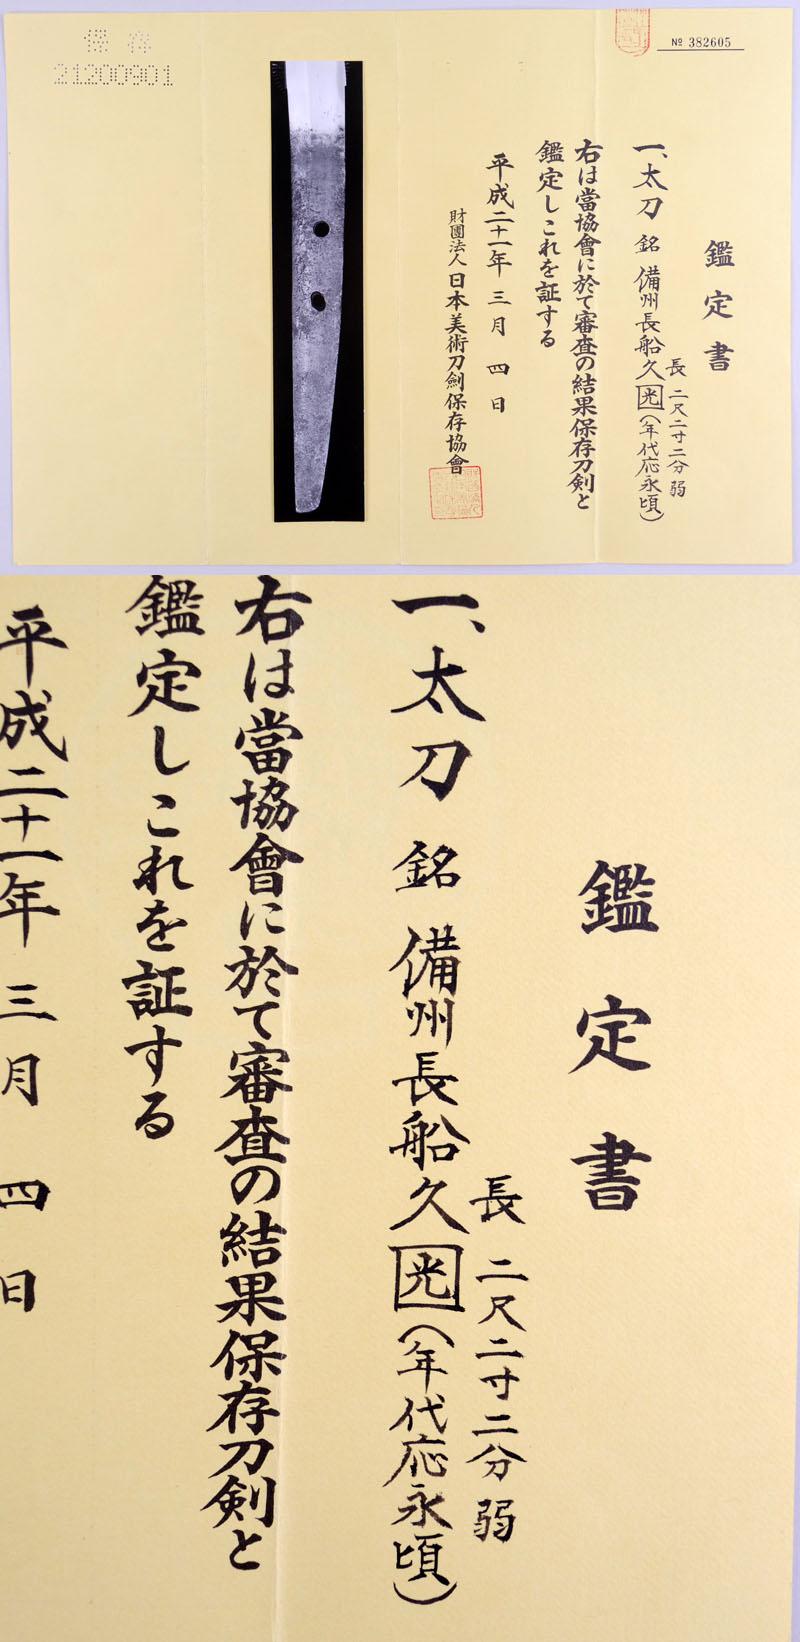 備州長船久光(年代応永頃) Picture of Certificate